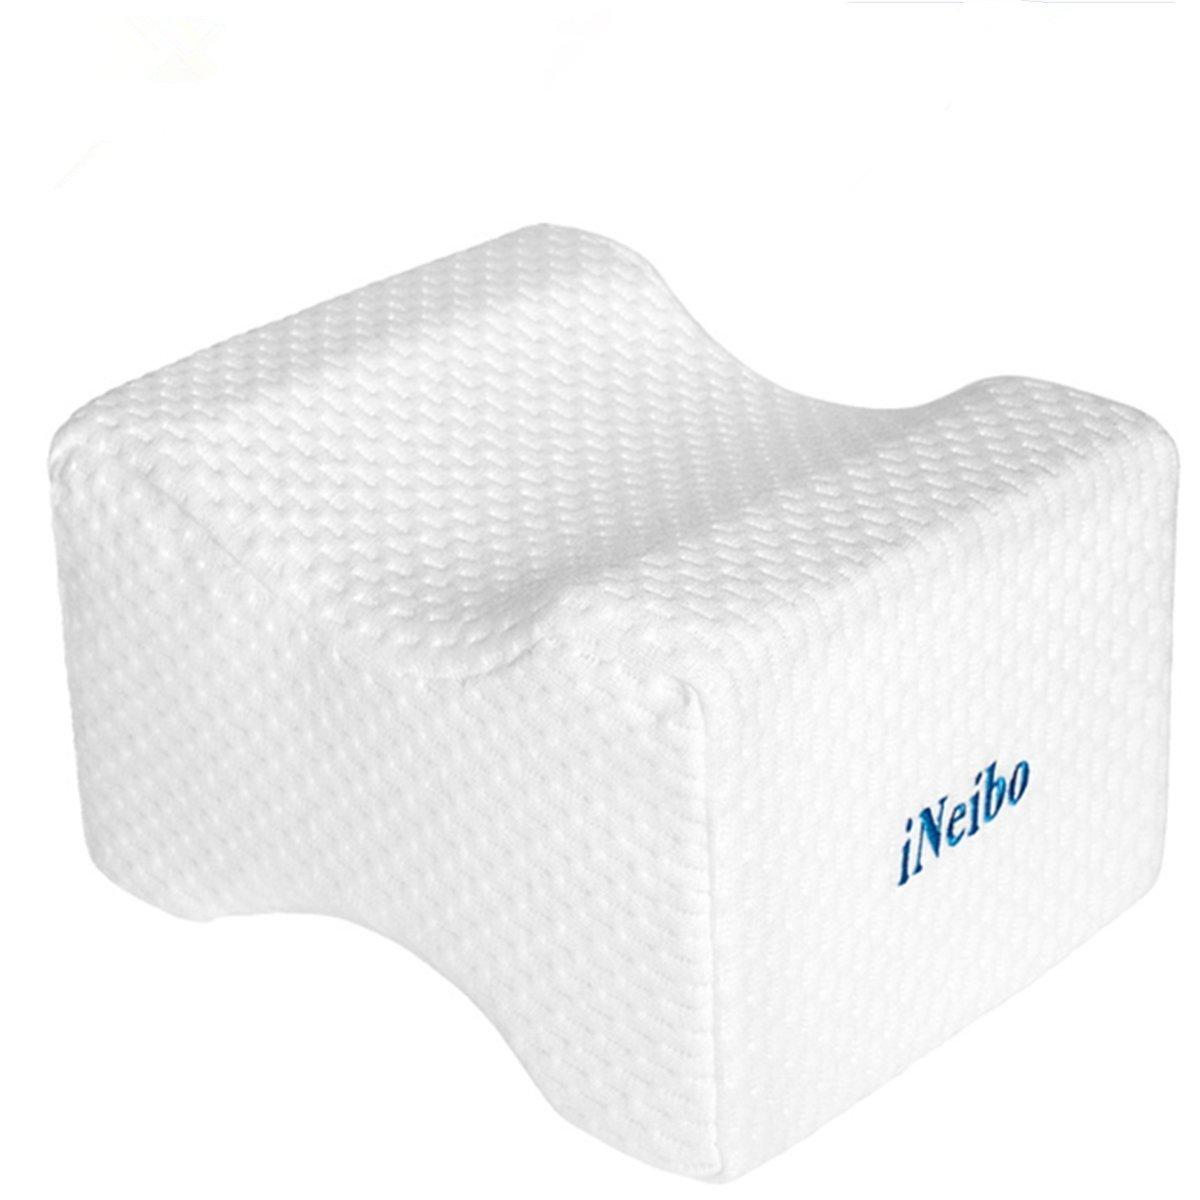 iNeibo Pain Relief Knee Leg Rest Pillow High Density Memory Foam Breathable Bamboo Fiber Hidden Zipper Washable Cover for Chronic Hip Joint Back Nerve Sciatica Pregnancy-Improve Sleeping iNeibo-33326169